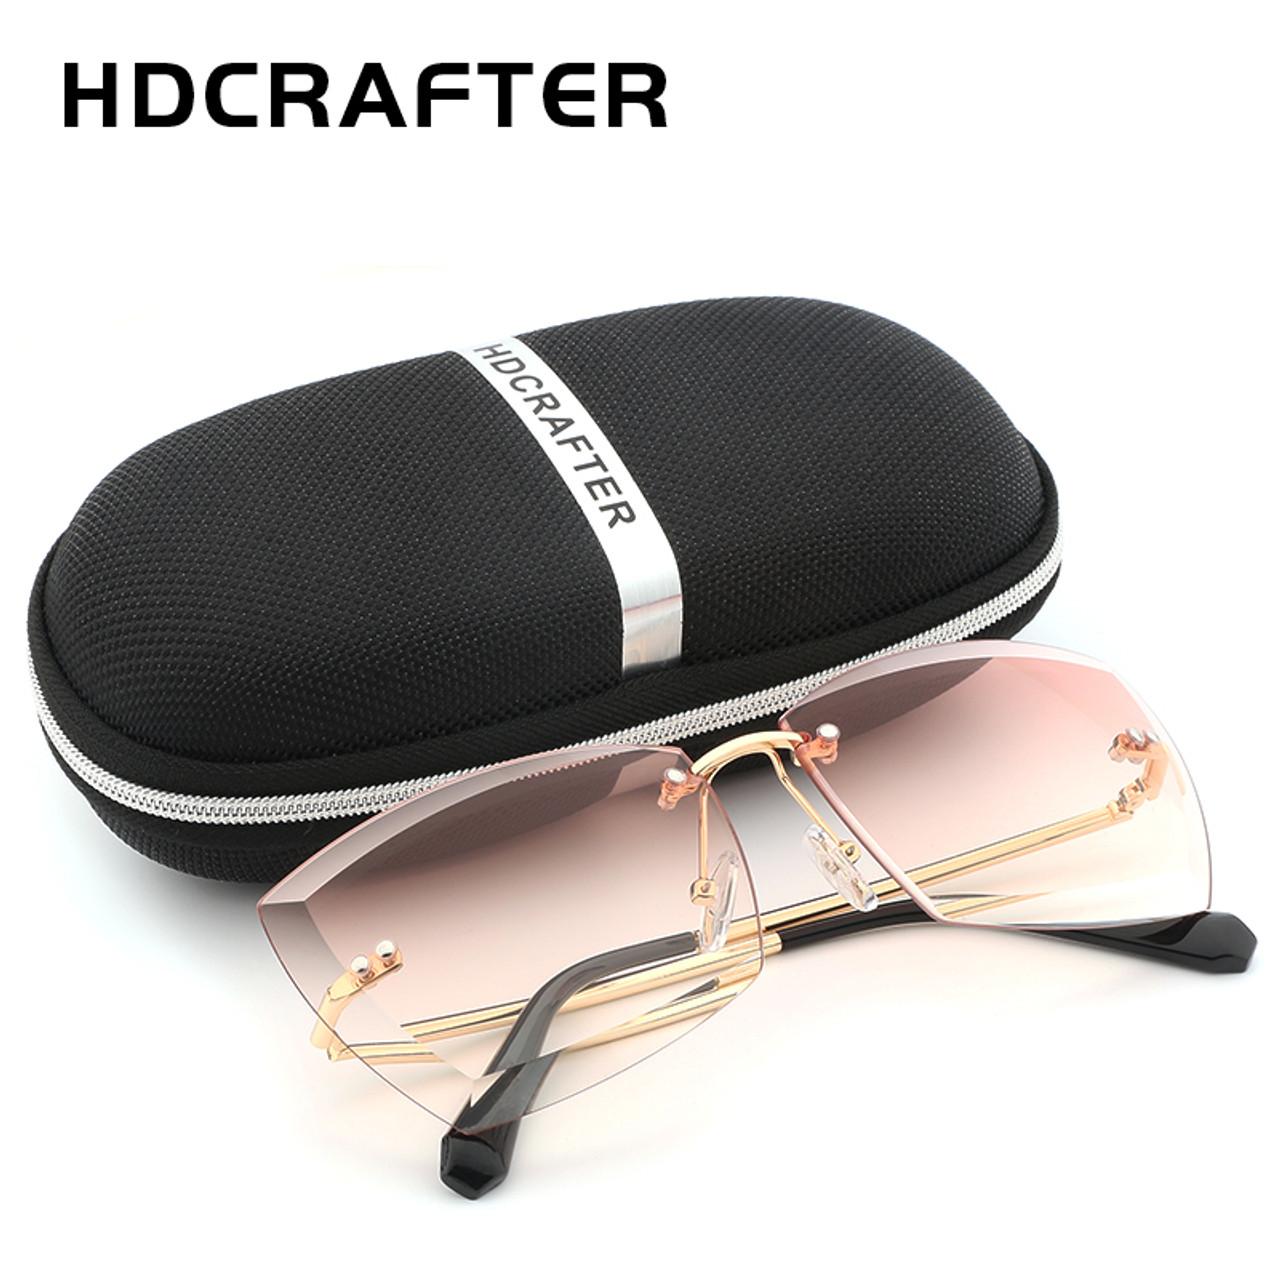 f47ae8f9c81 ... HDCRAFTER Oversized Women Sunglasses Square Rimless Diamond cutting  Lens Brand Designer Fashion Shades Sun Glasses With ...